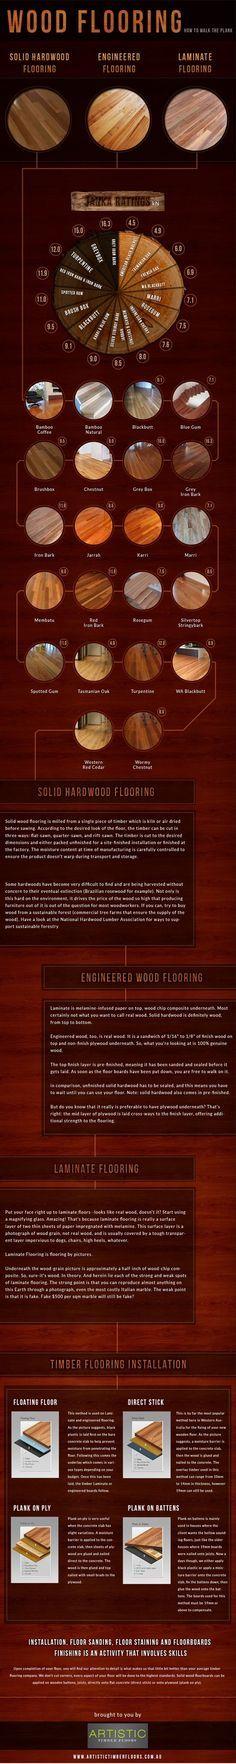 Best 20 Types Of Wood Flooring Ideas On Pinterest